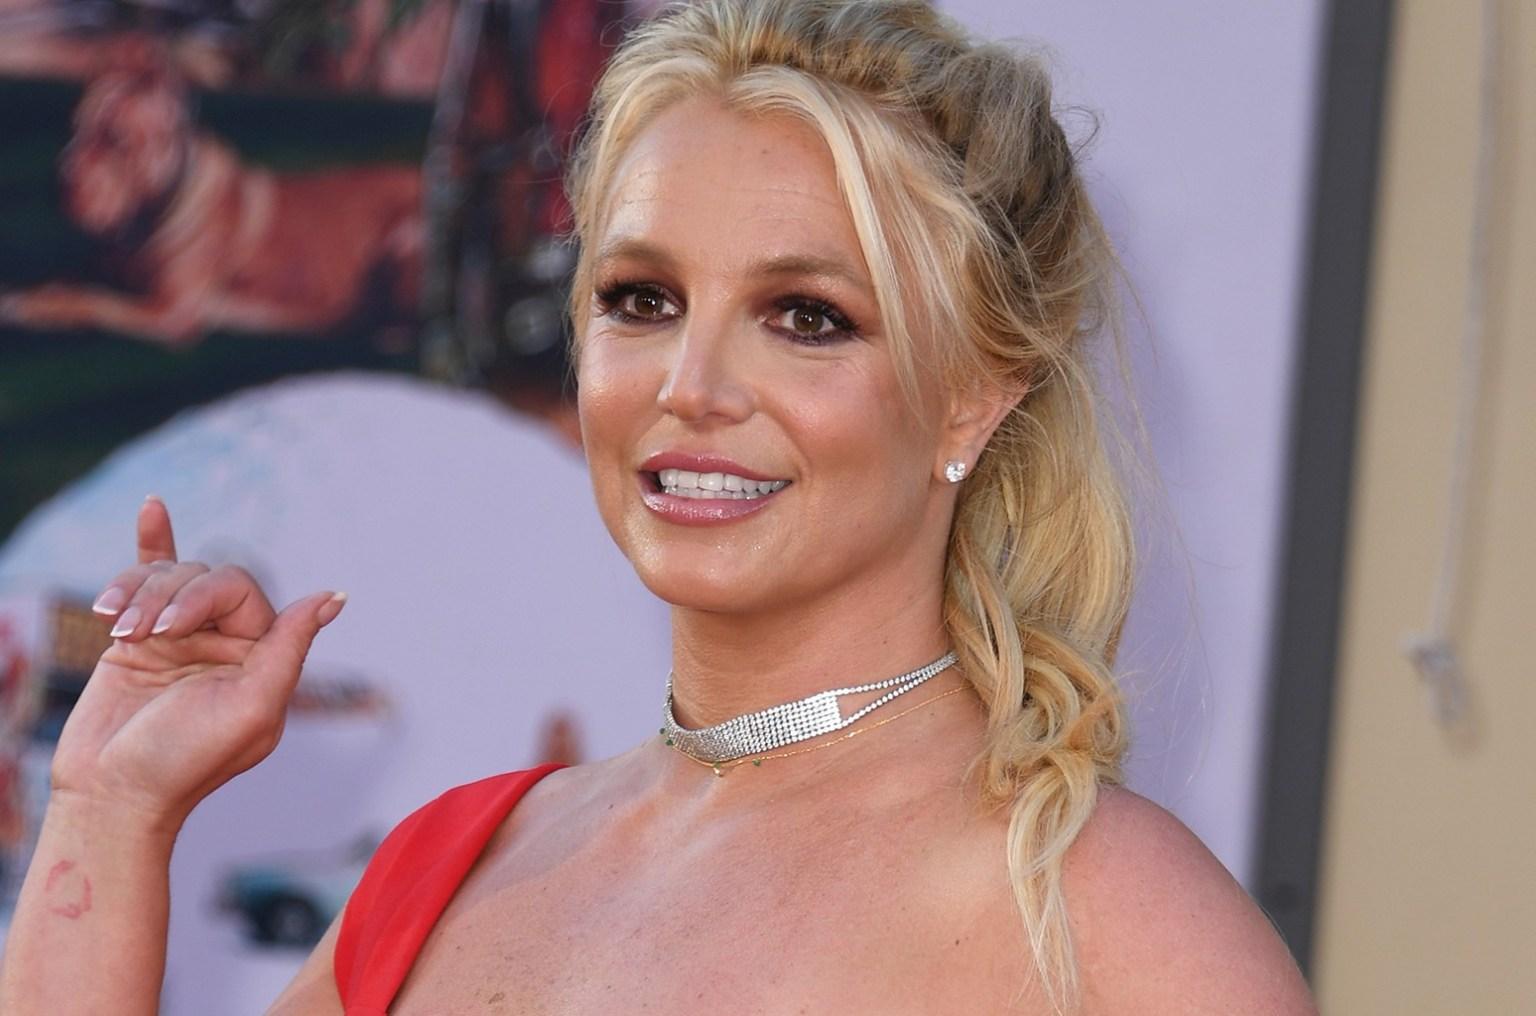 'Britney Vs. Spears': Anuncian documental sobre la custodia de la cantante